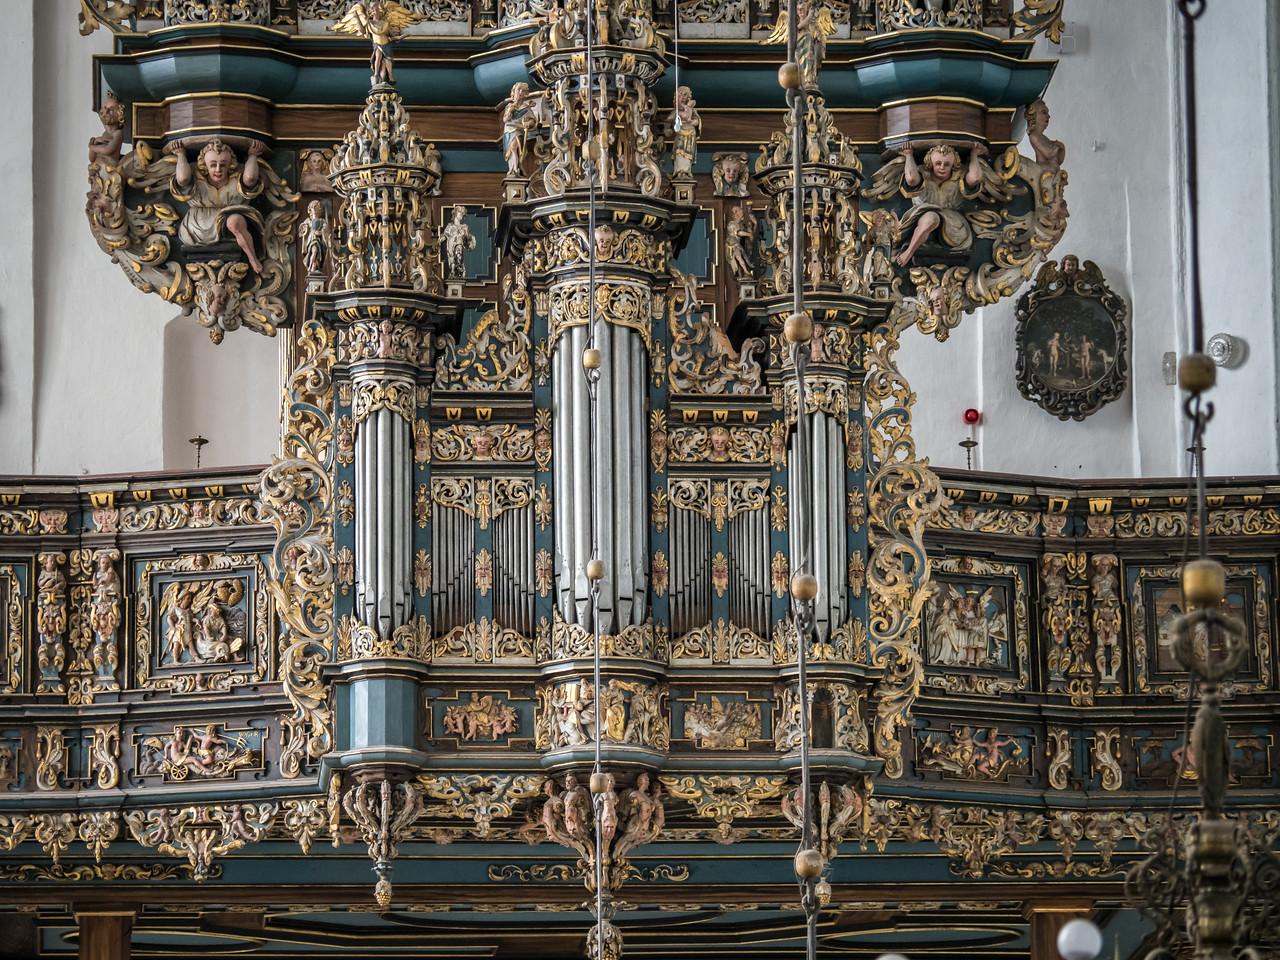 Organ, St Mary's Basilica (1343)